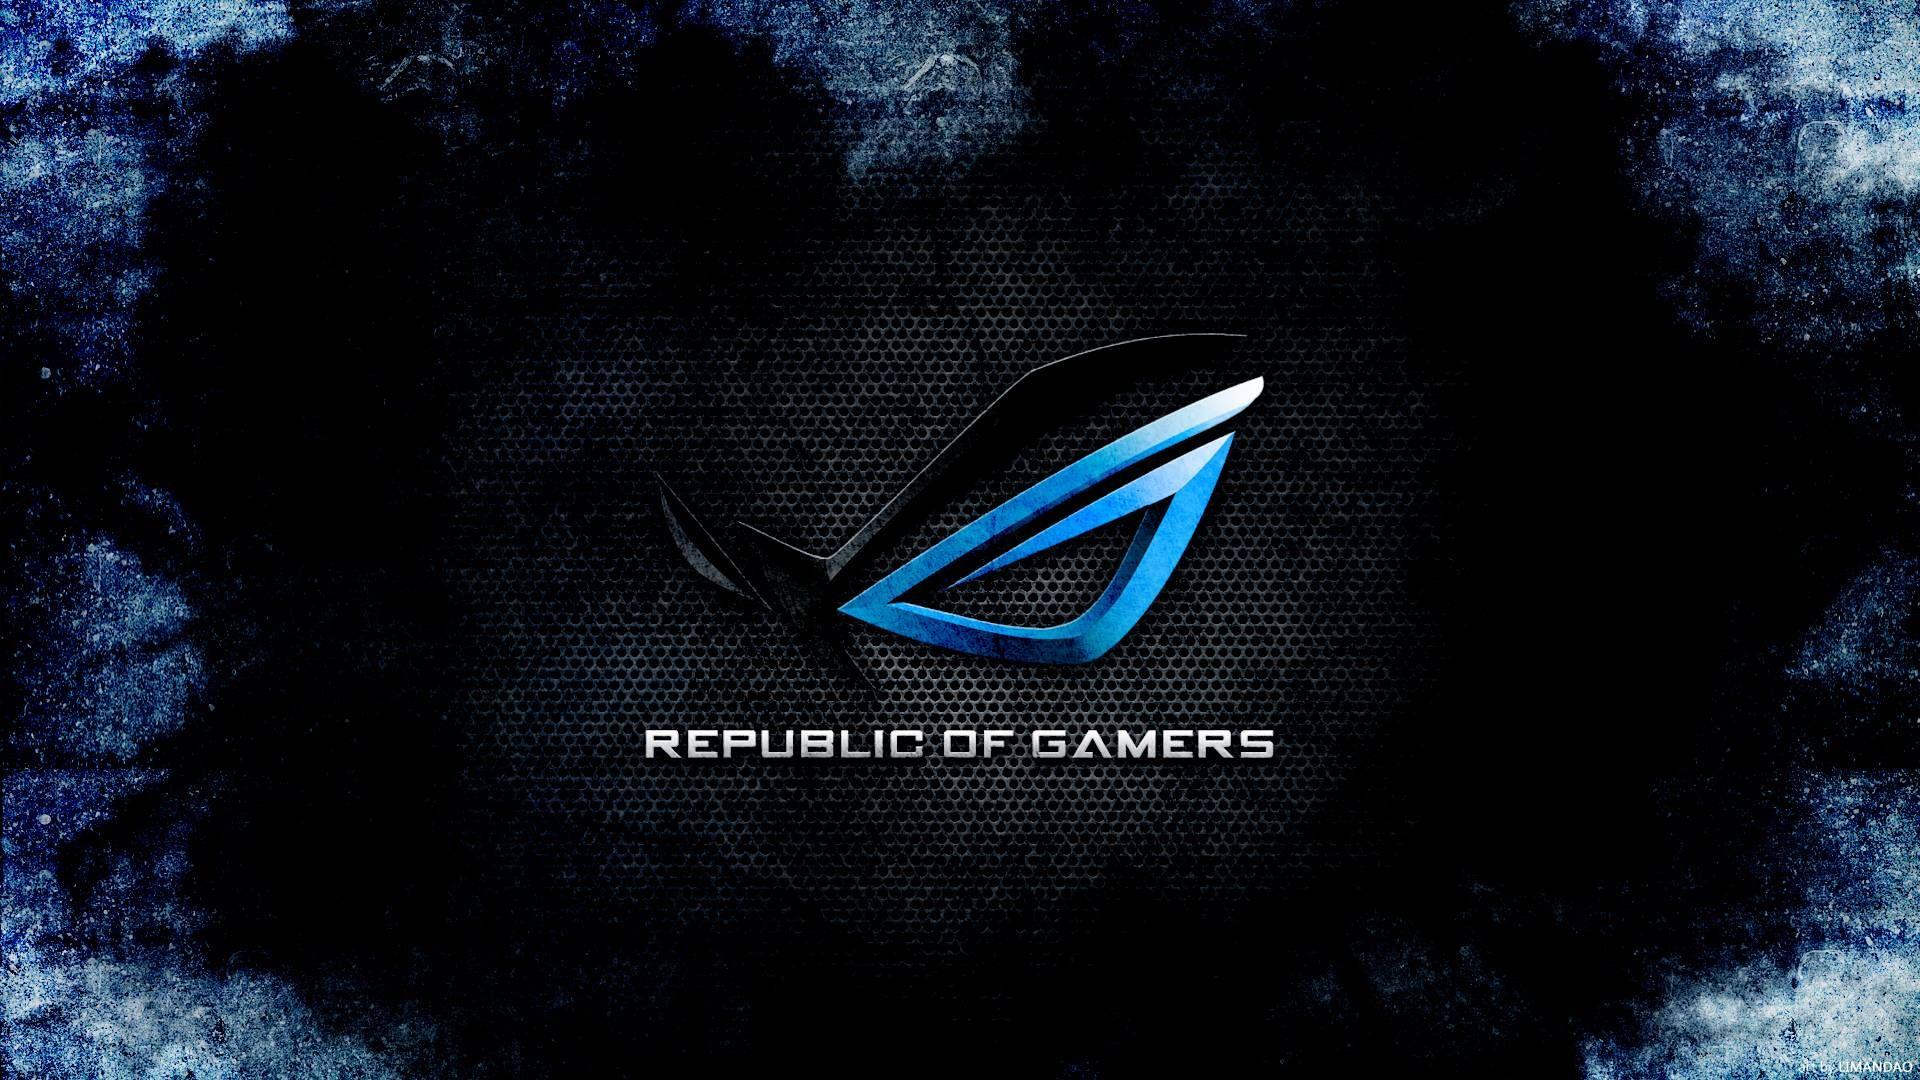 Asus Republic Of Gamers Wallpapers Wallpaper Cave Gaming Wallpapers Black And Blue Wallpaper Asus Rog